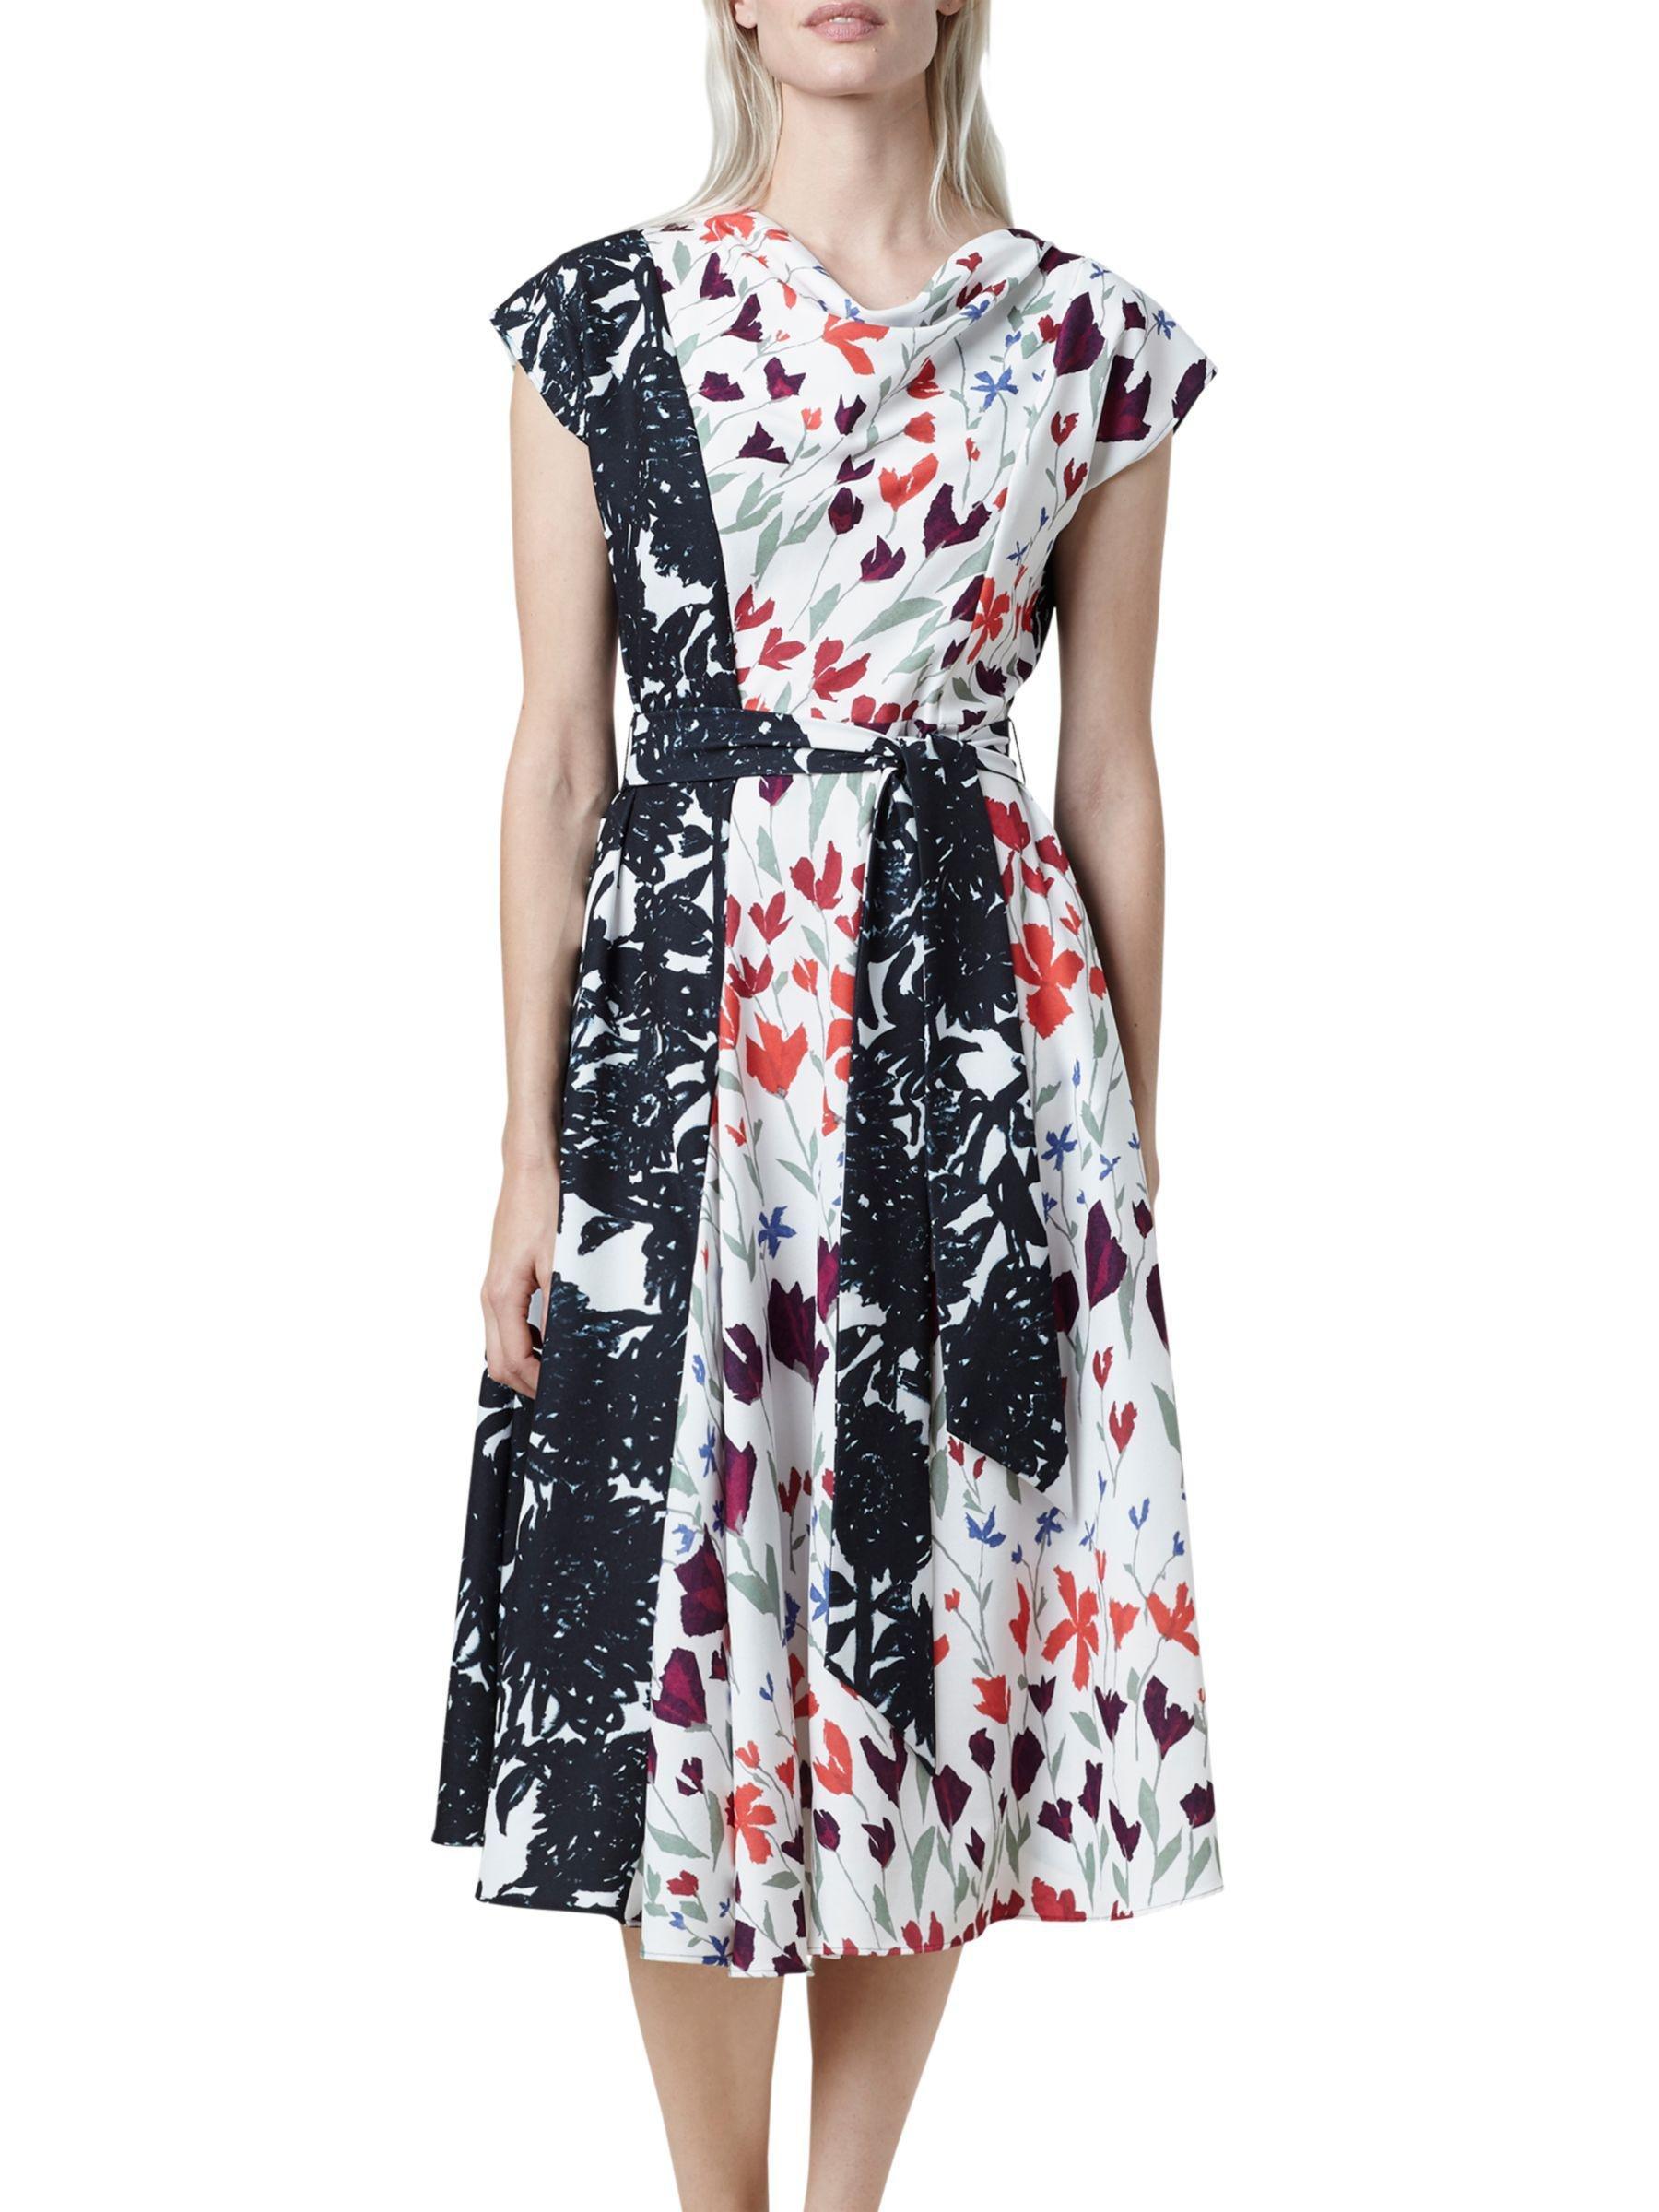 Goodrich Wild Flowers Print Shift Dress Finery Sale New Arrival FXlQsulb